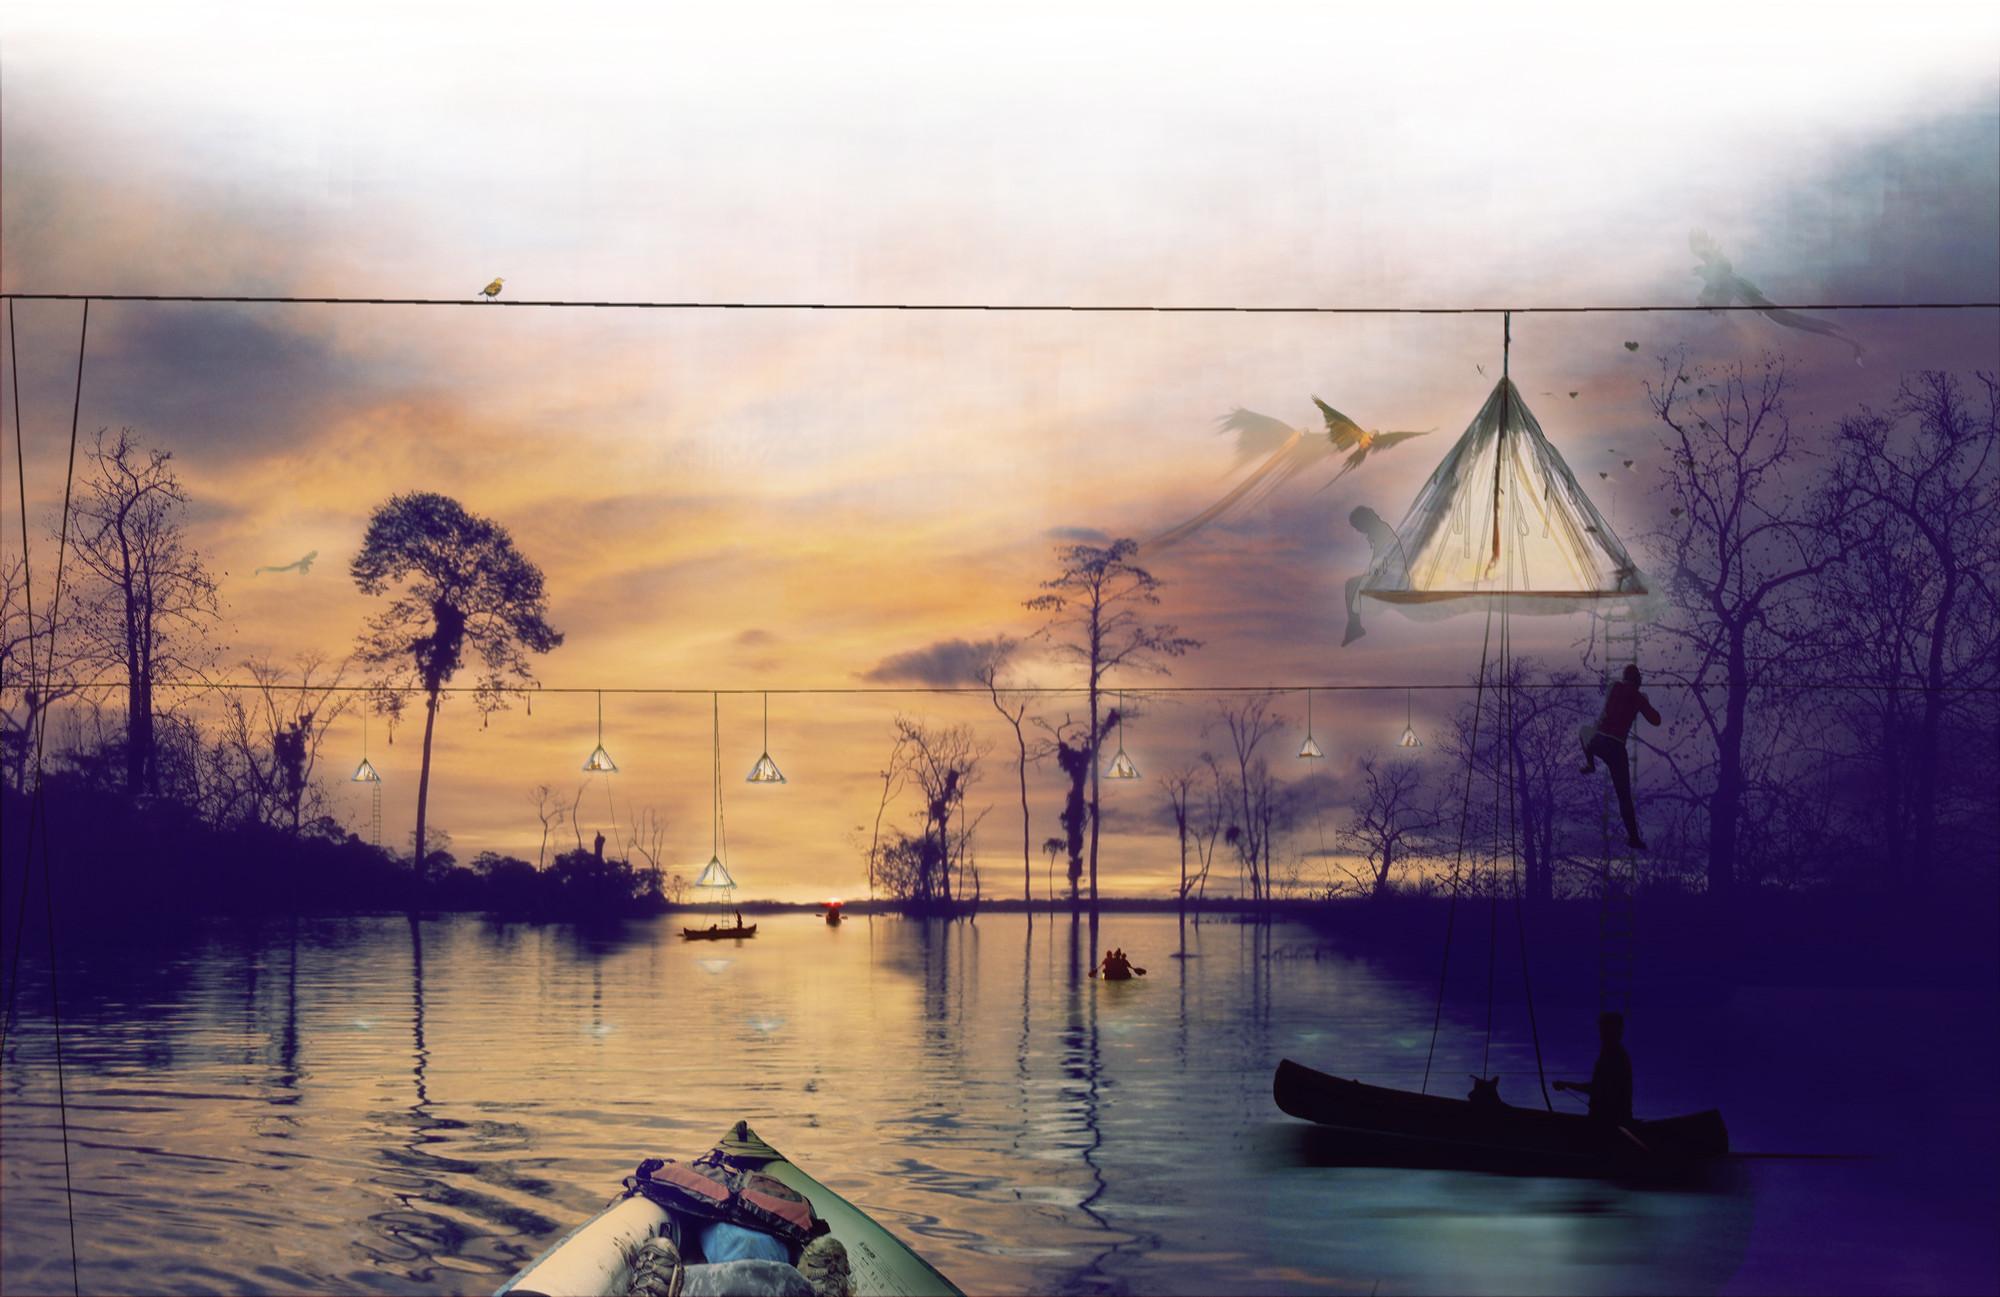 Primer Lugar en Concurso de Ideas Nature Observatory of Amazonia (NOA) / Brasil, Cortesia de Equipo Primer Lugar